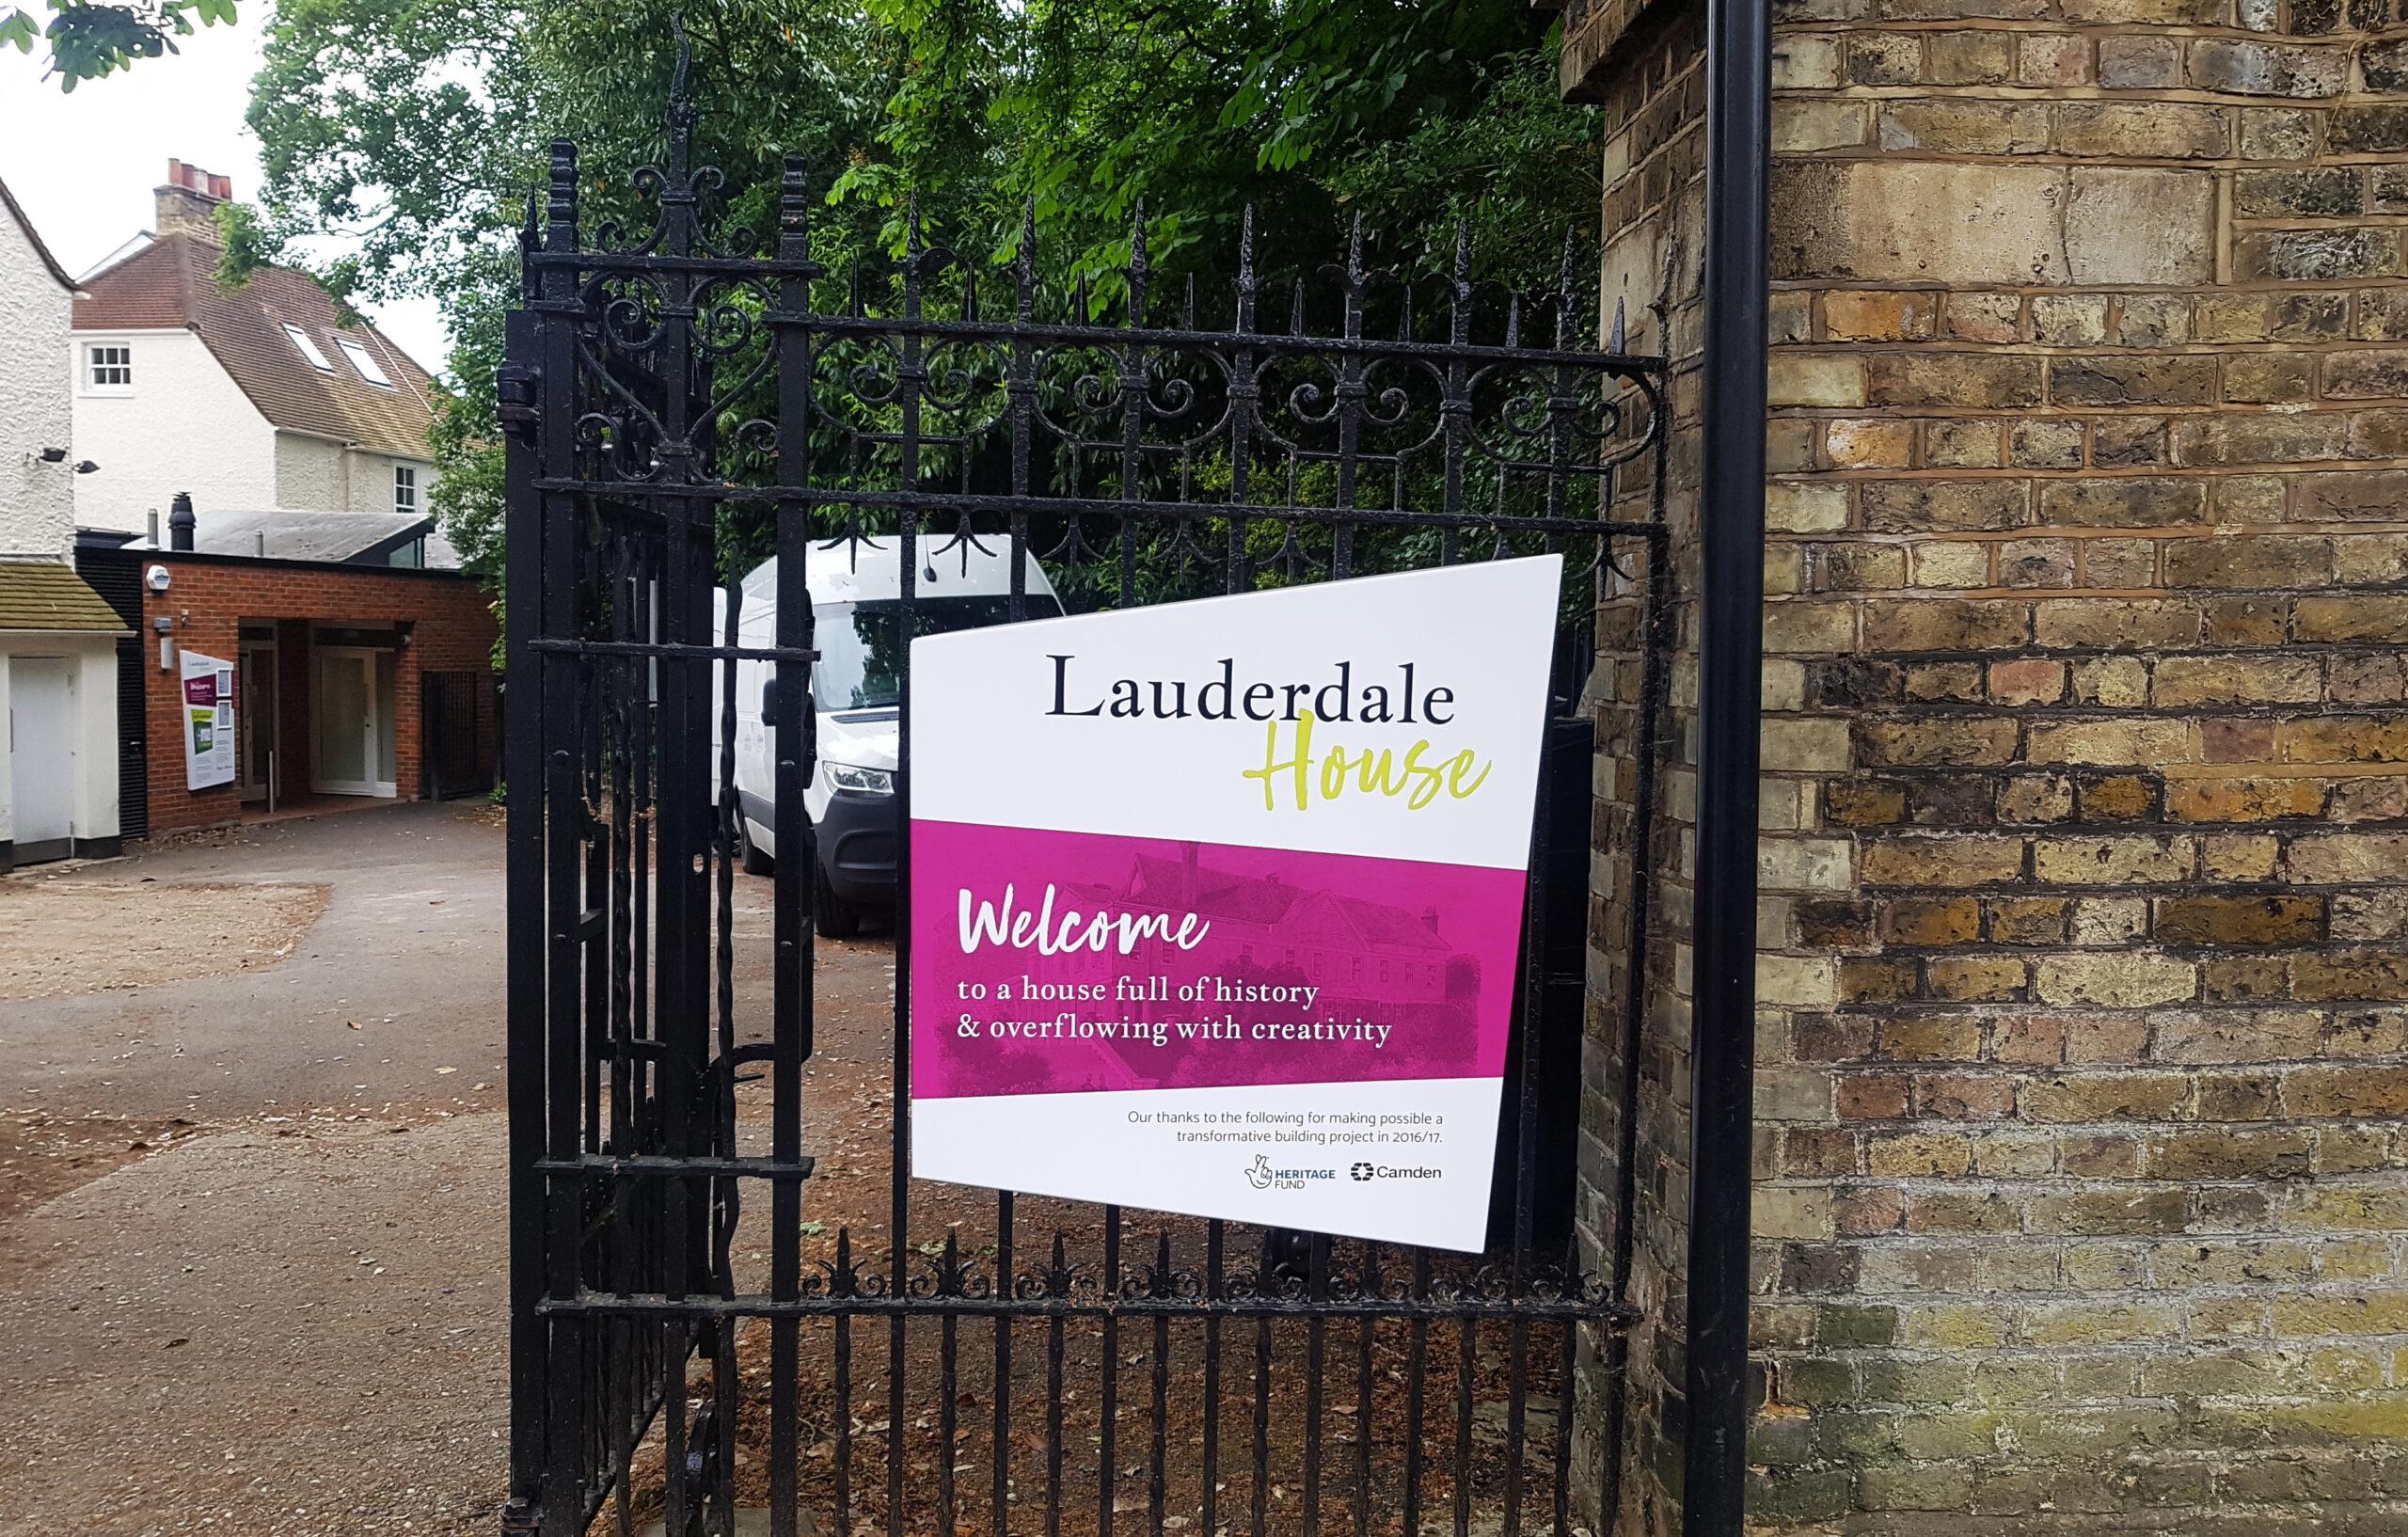 Lauderdale-House-Concept-Group1